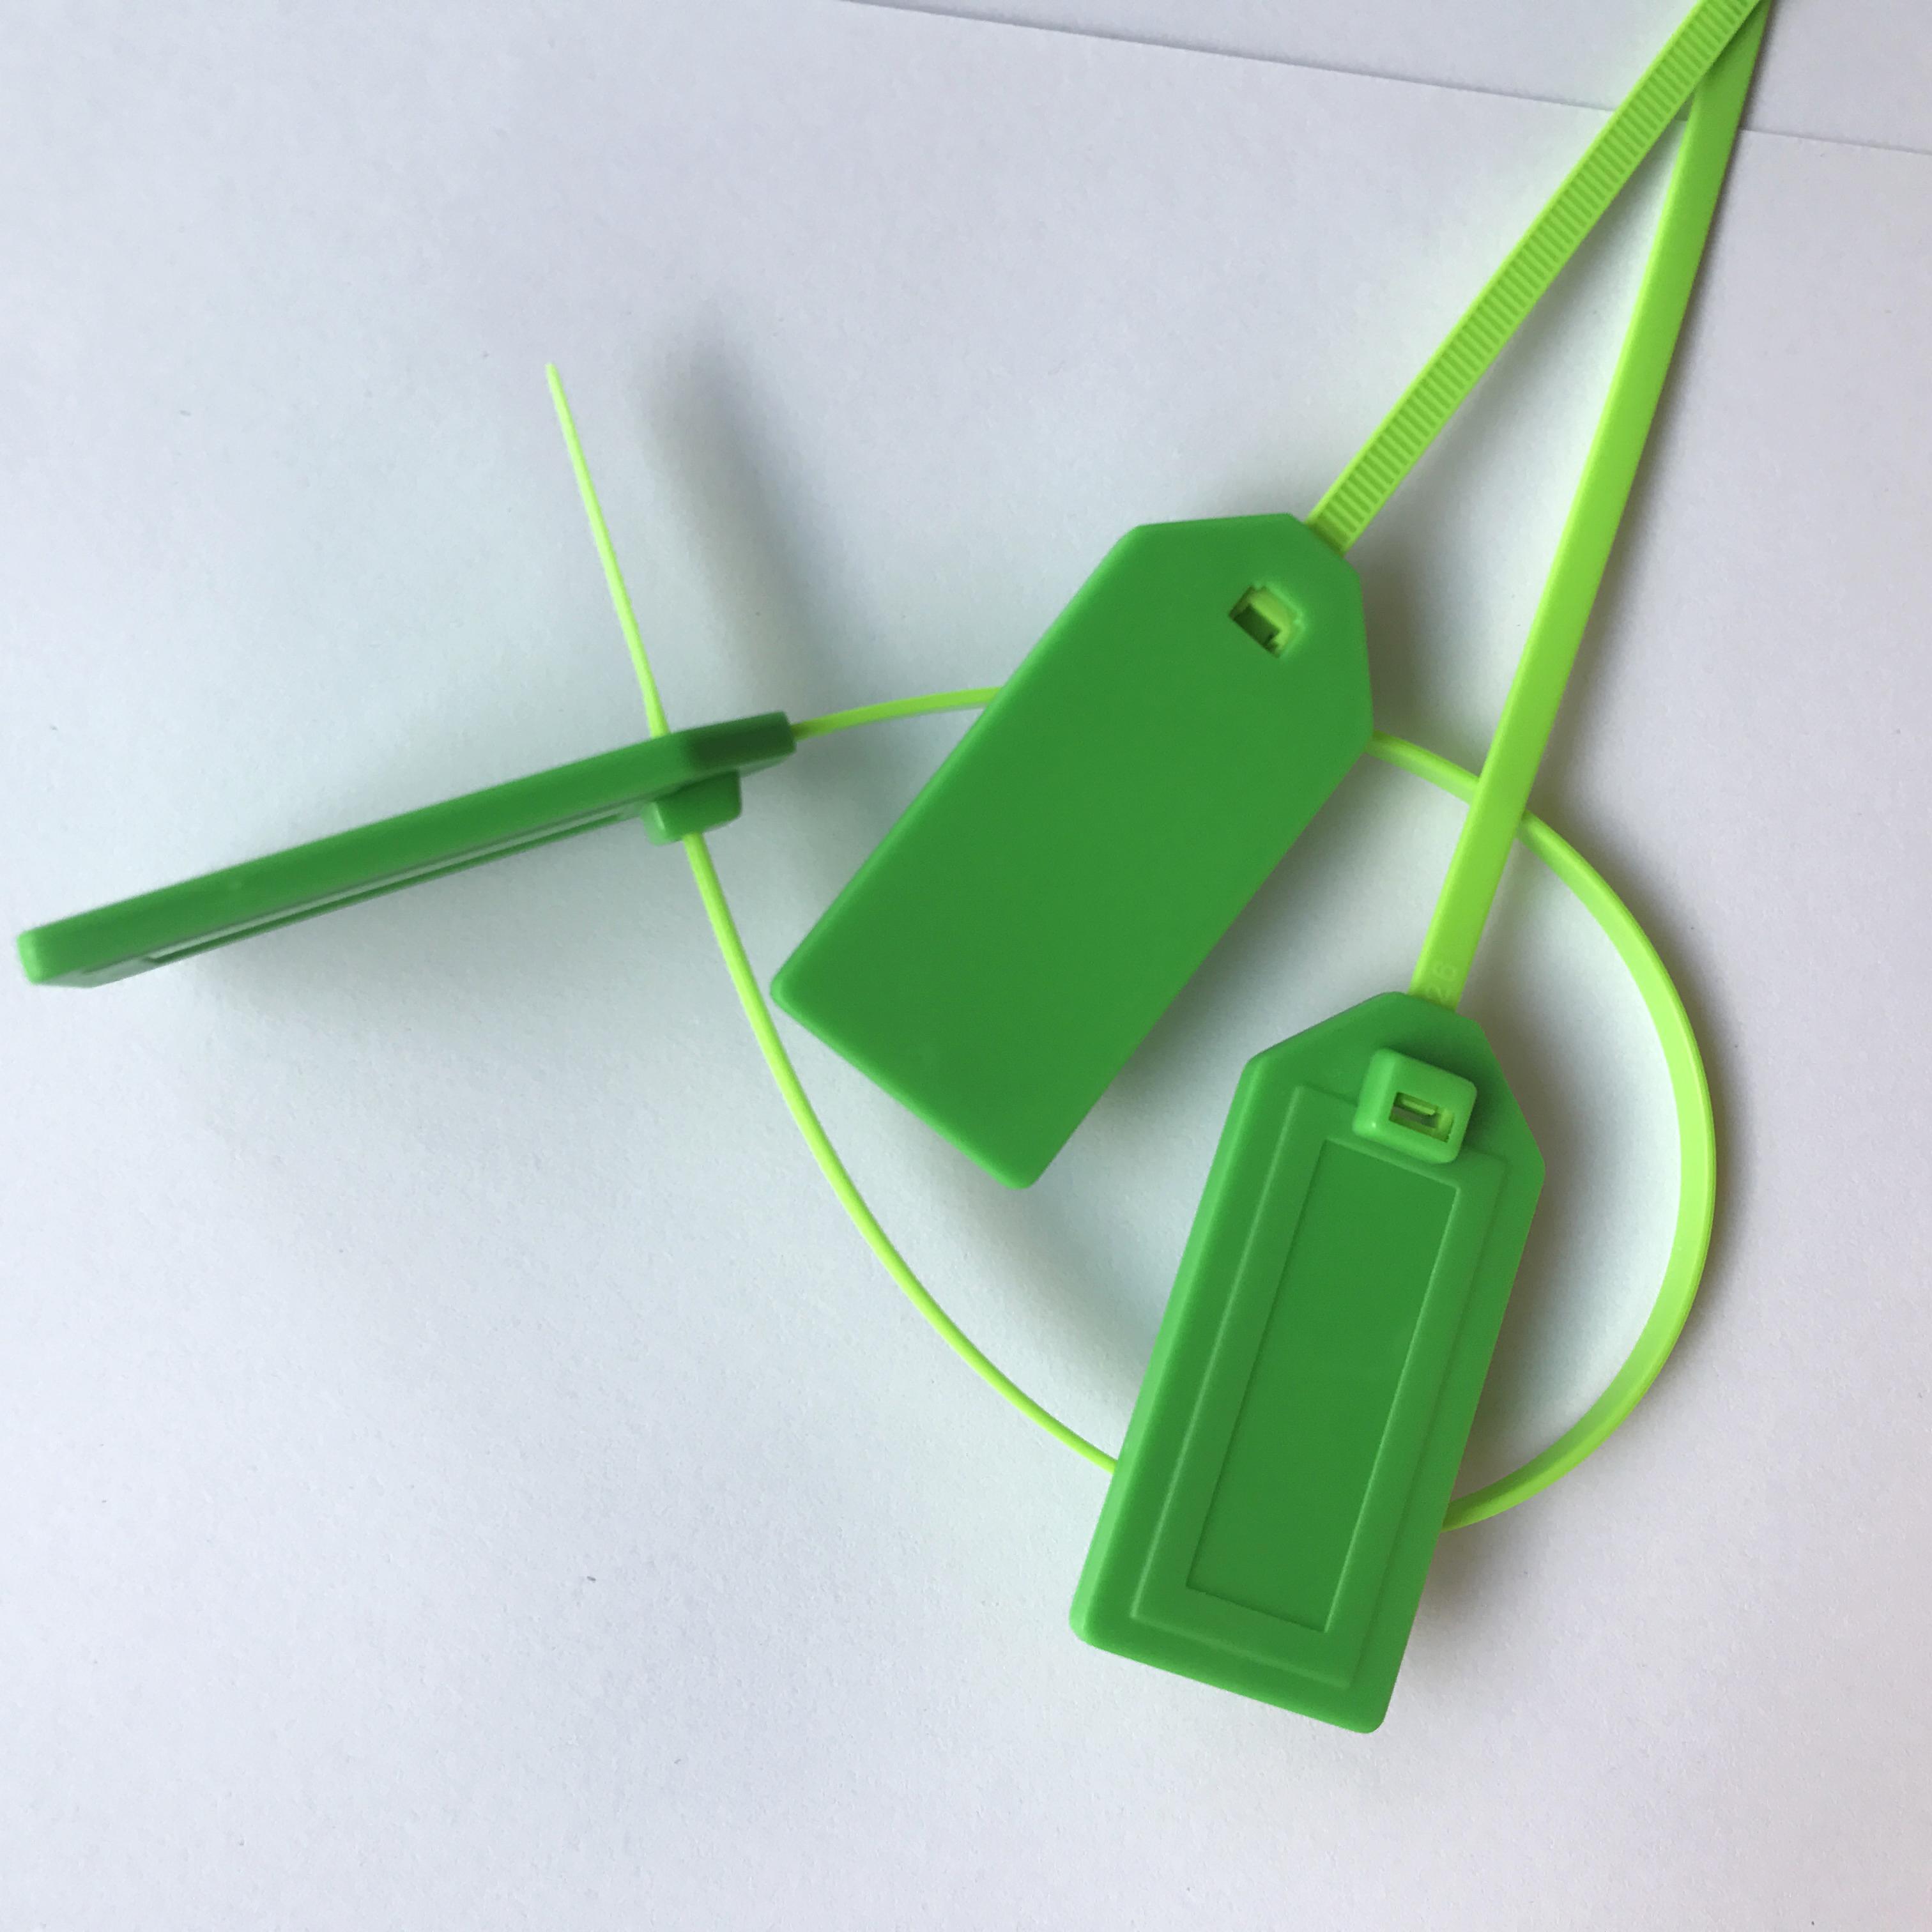 RFID超高频电子标签扎带900M标签UHF超高频扎带无源塑料封条标签